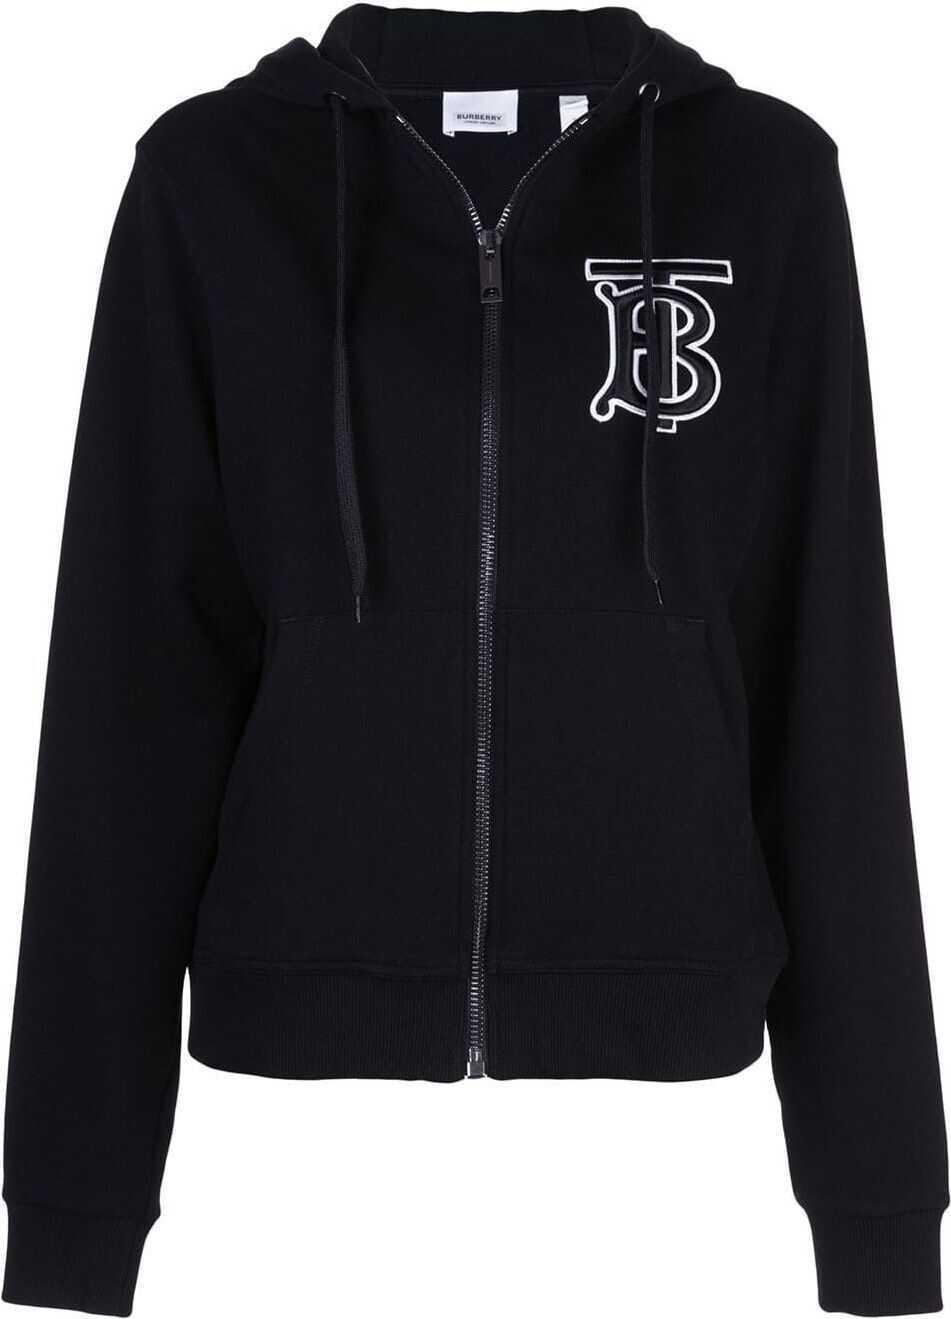 Burberry Cotton Sweatshirt BLACK